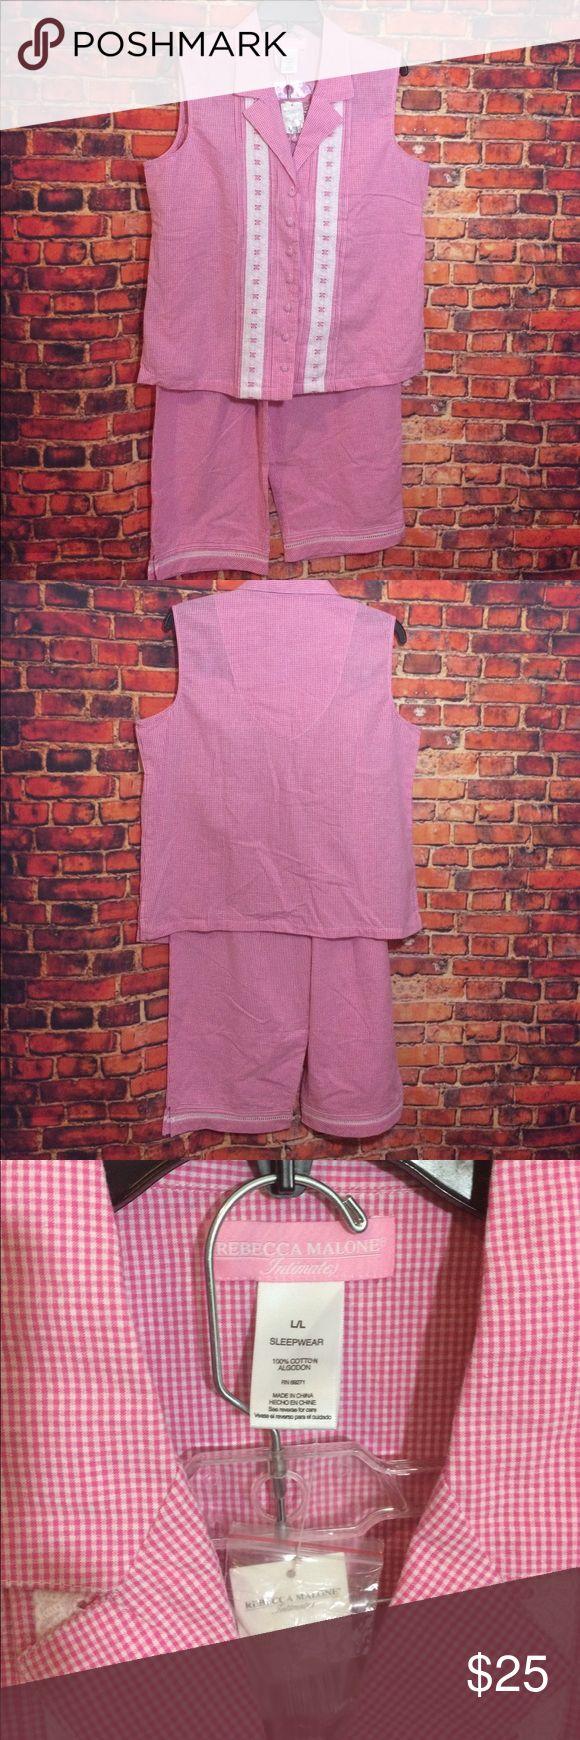 Molly Malone Pink Check Gingham Pajamas Sz L Molly Malone Pink Check Gingham Pajamas Sz L Molly Malone Intimates & Sleepwear Pajamas